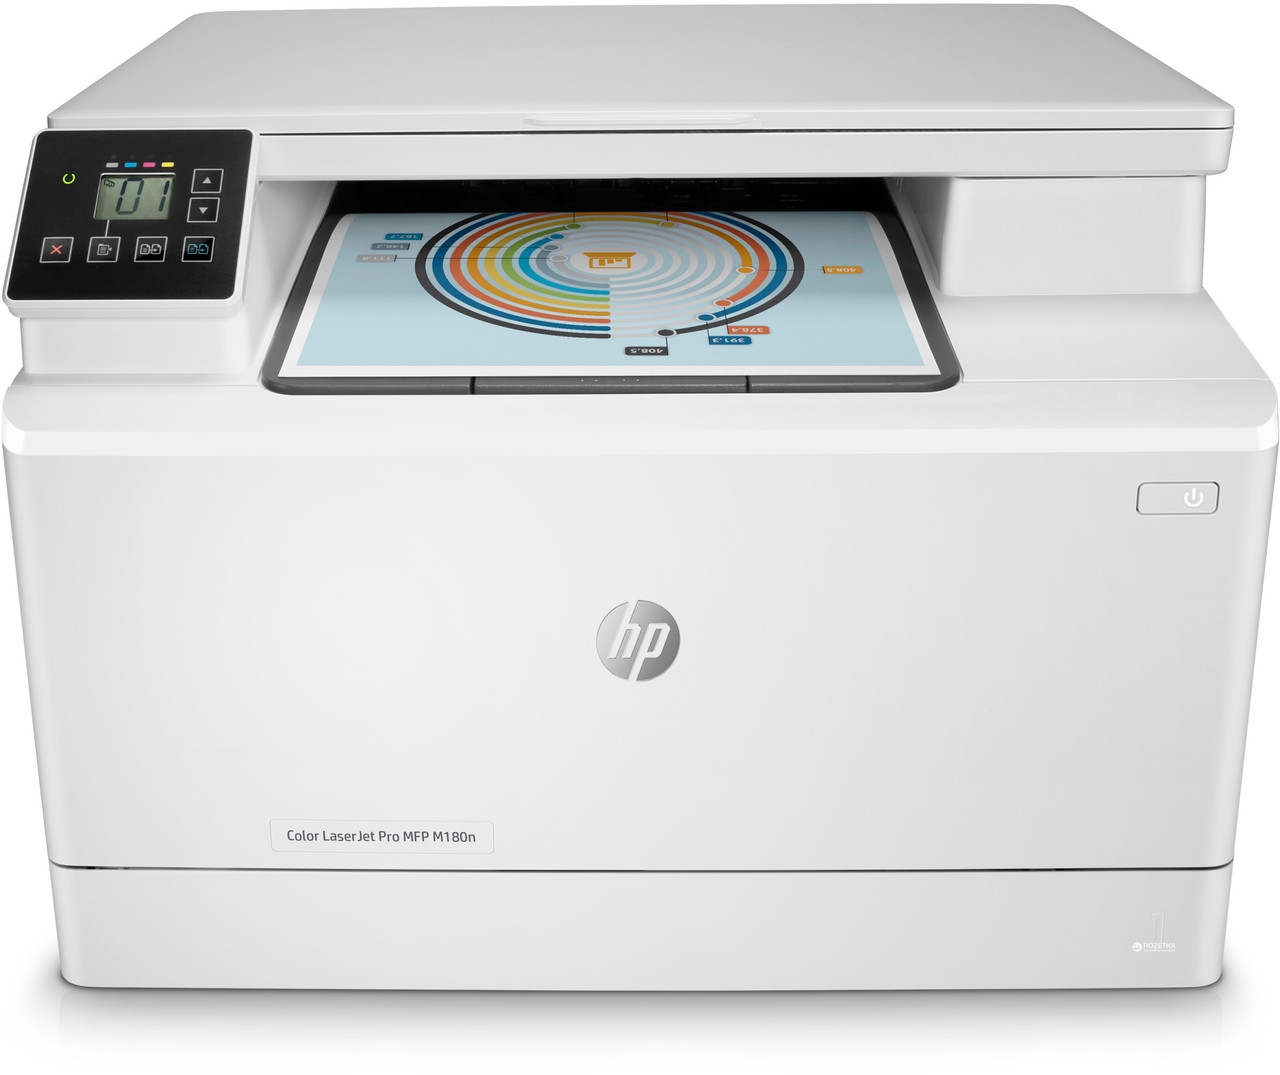 Цветное МФУ HP Color LaserJet Pro M180n